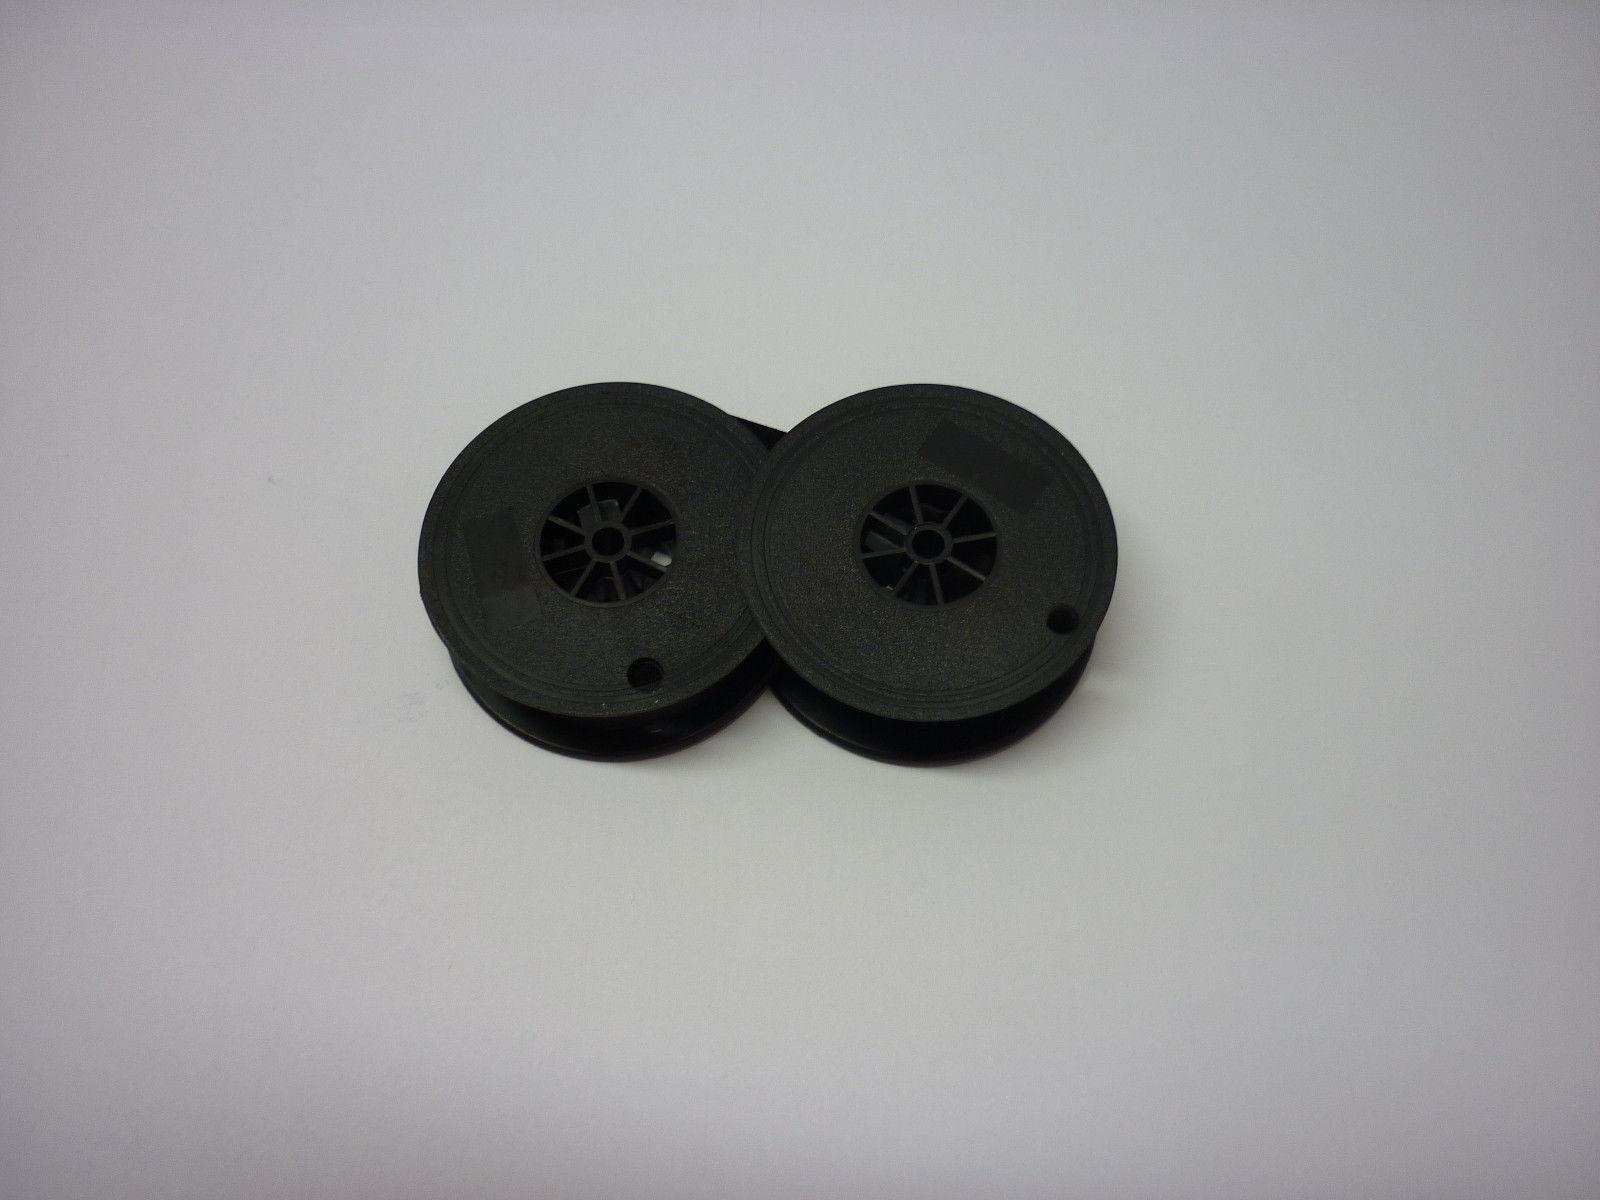 Penncrest Concord 12 Typewriter Ribbon Black Twin Spool